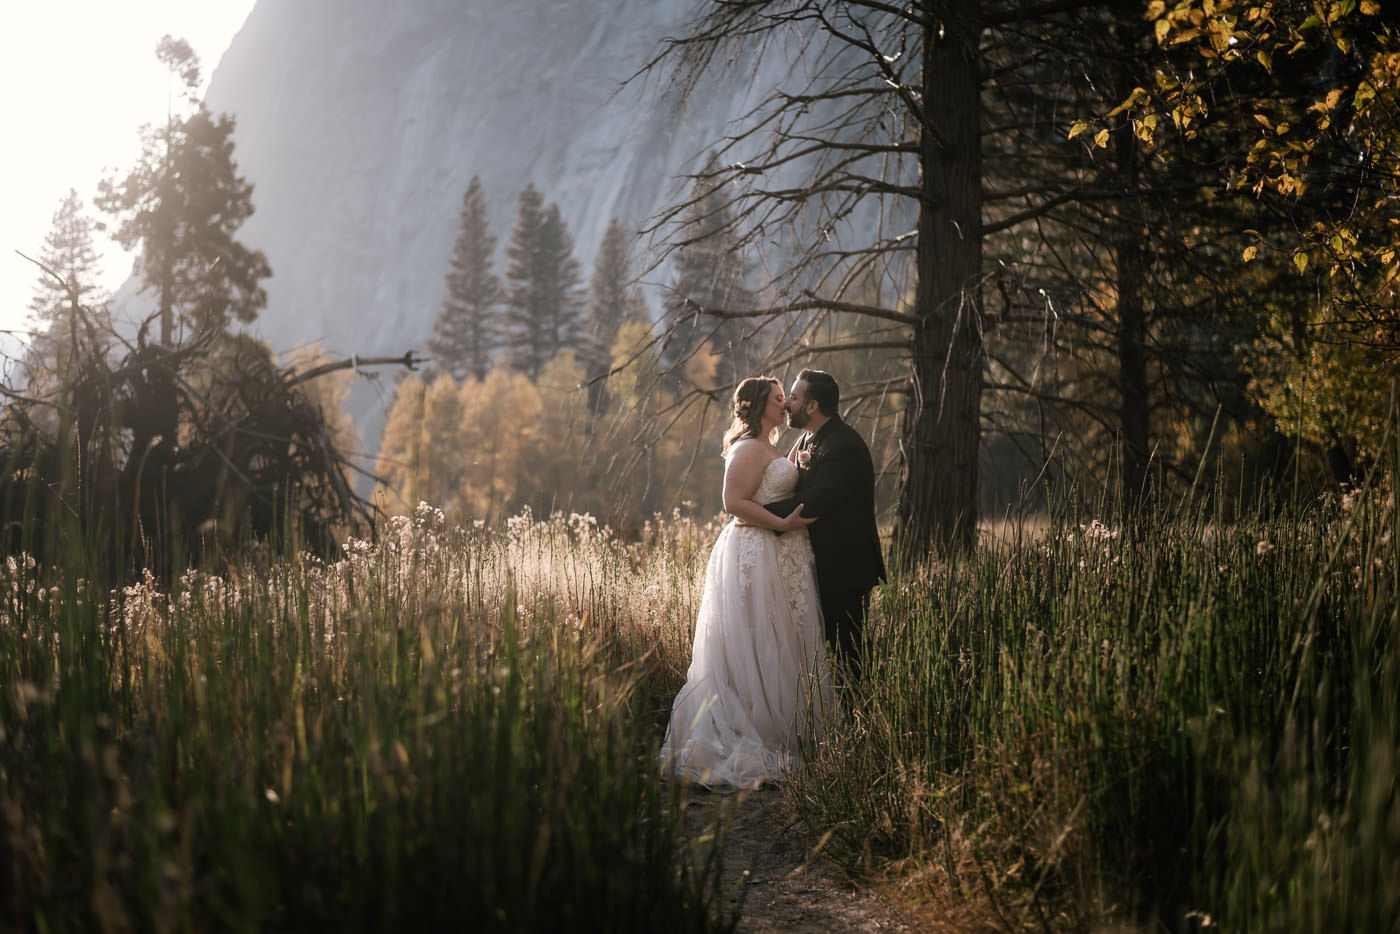 yosemite-meadow-wedding-photos-sunset-10.jpg